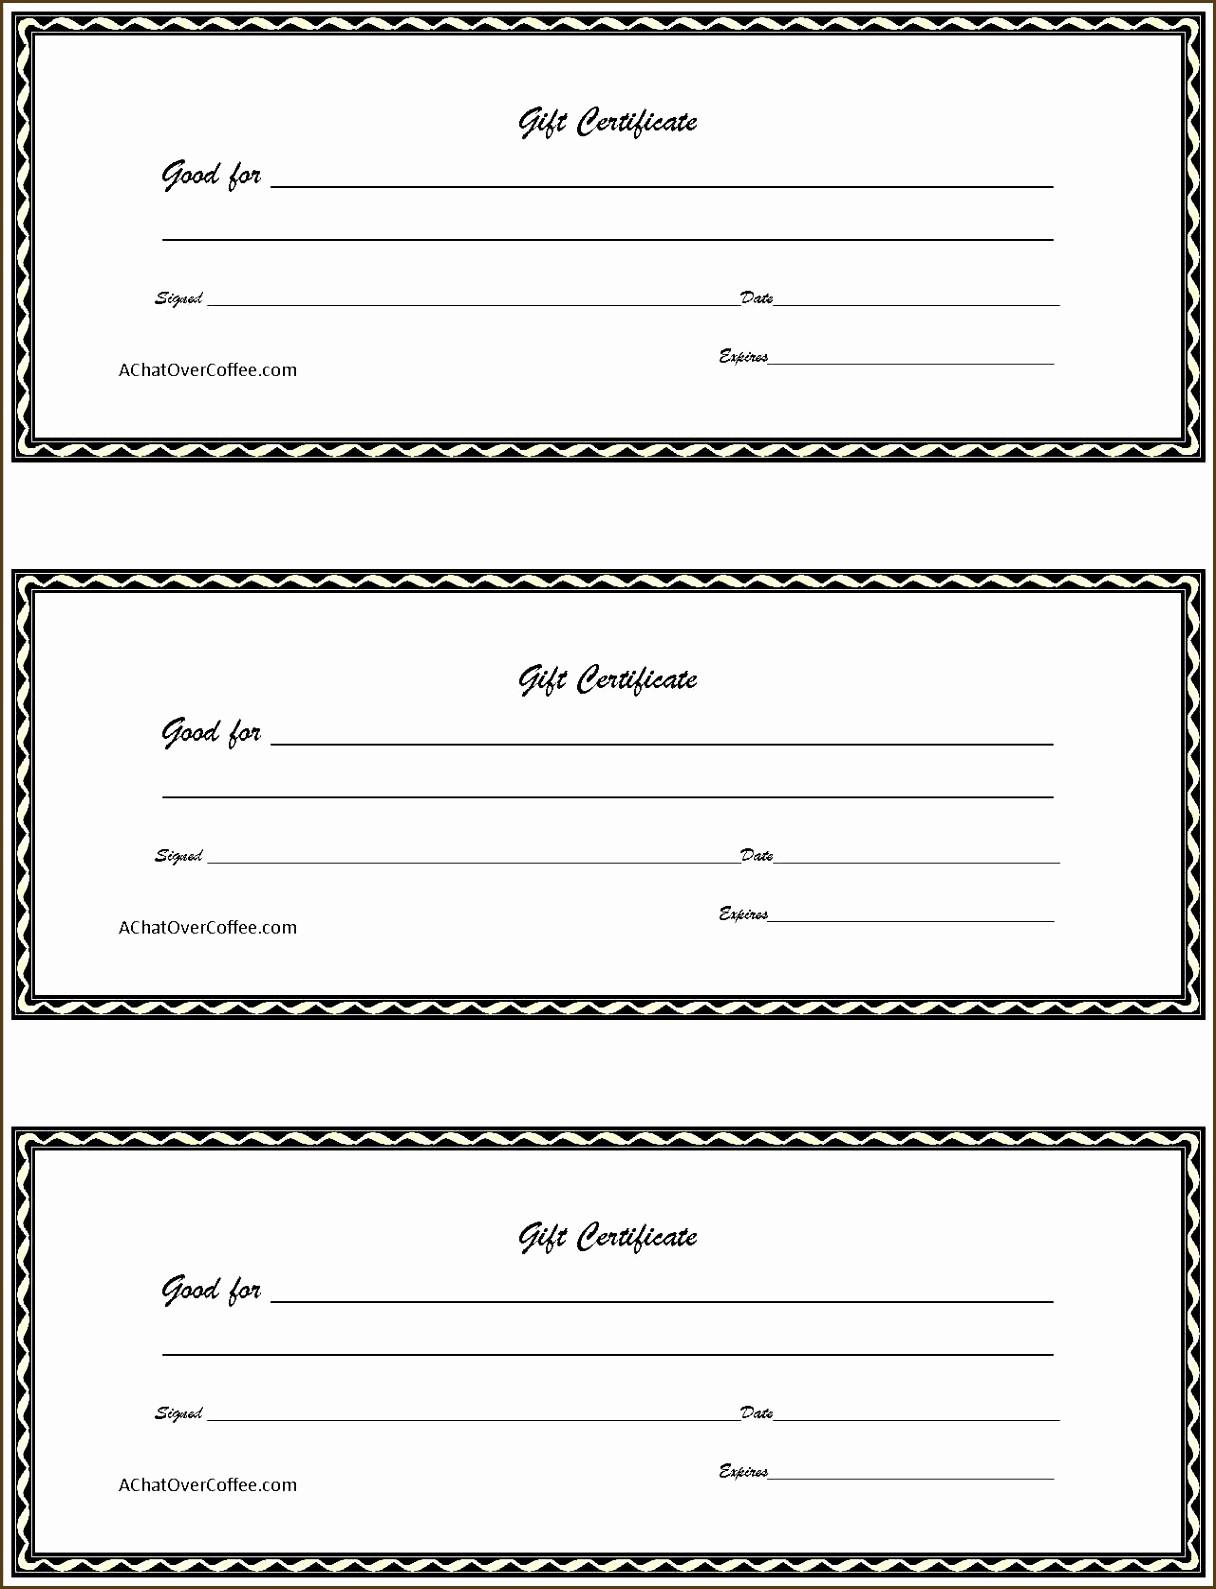 Printable Gift Certificates Online Free Inspirational 20 Free Gift Certificate Template